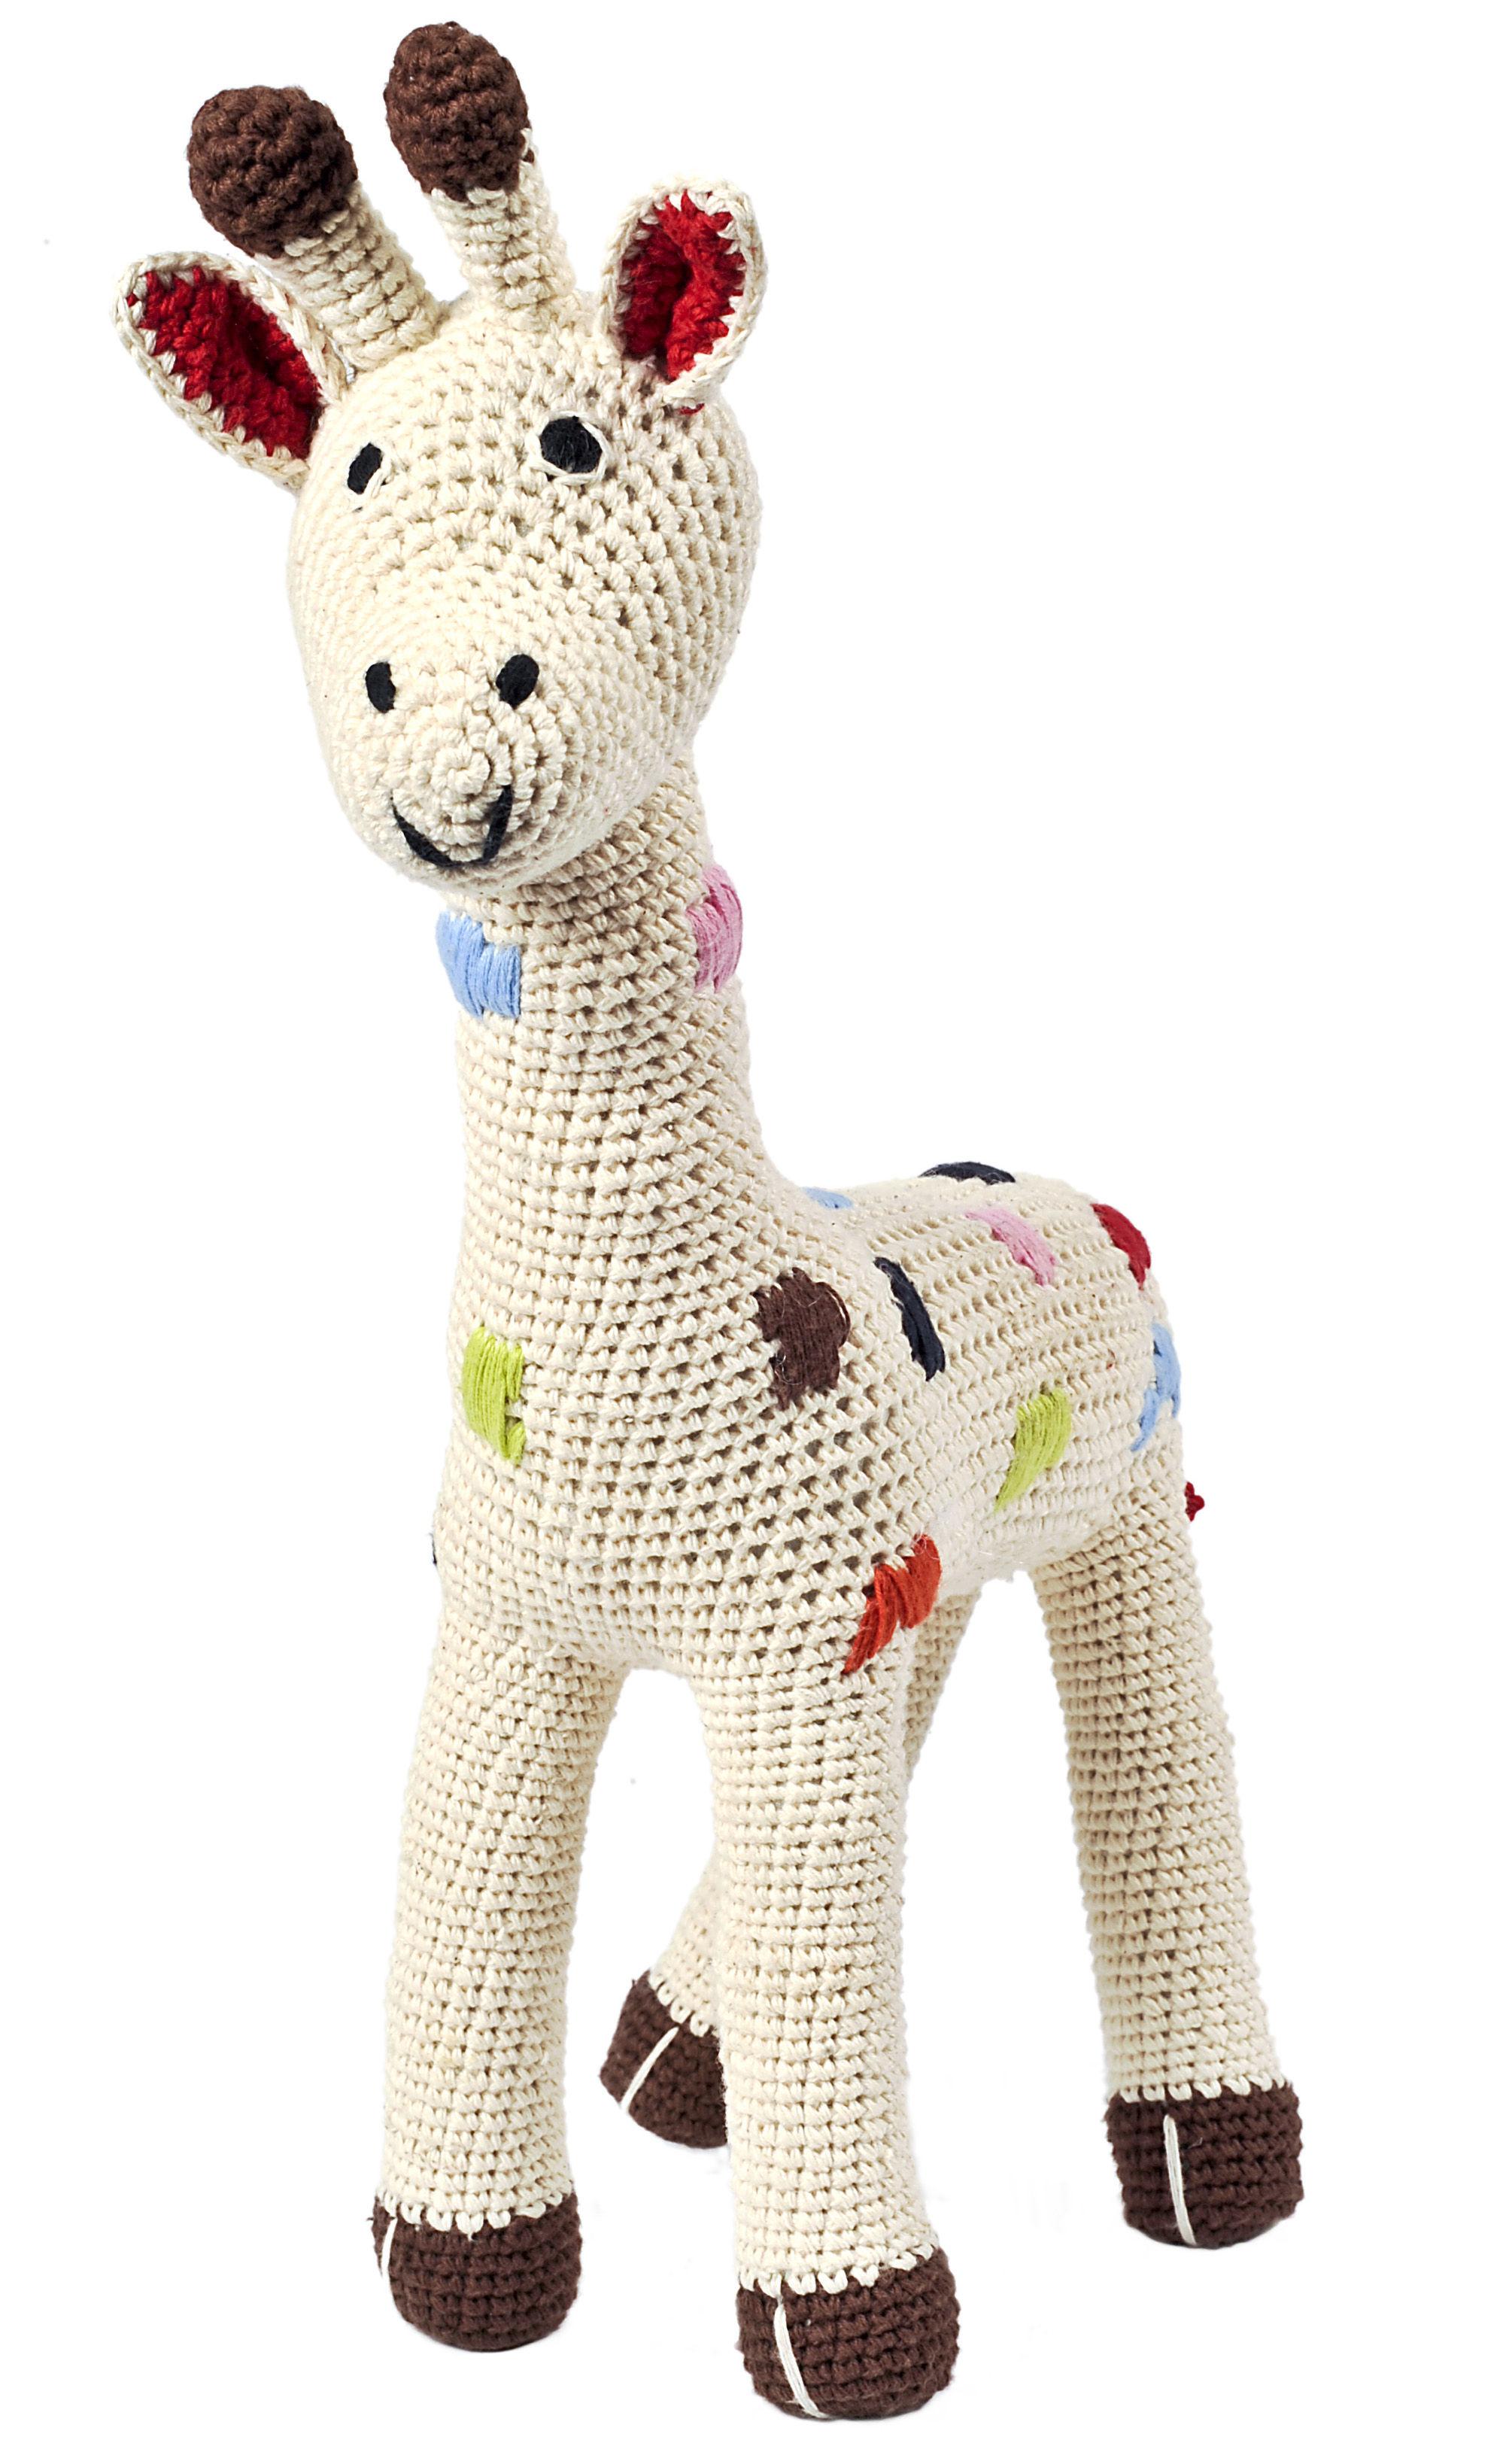 Cuddly Amigurumi Giraffe : Girafe Cuddly toy - Crochet cuddly toy Nature by Anne ...